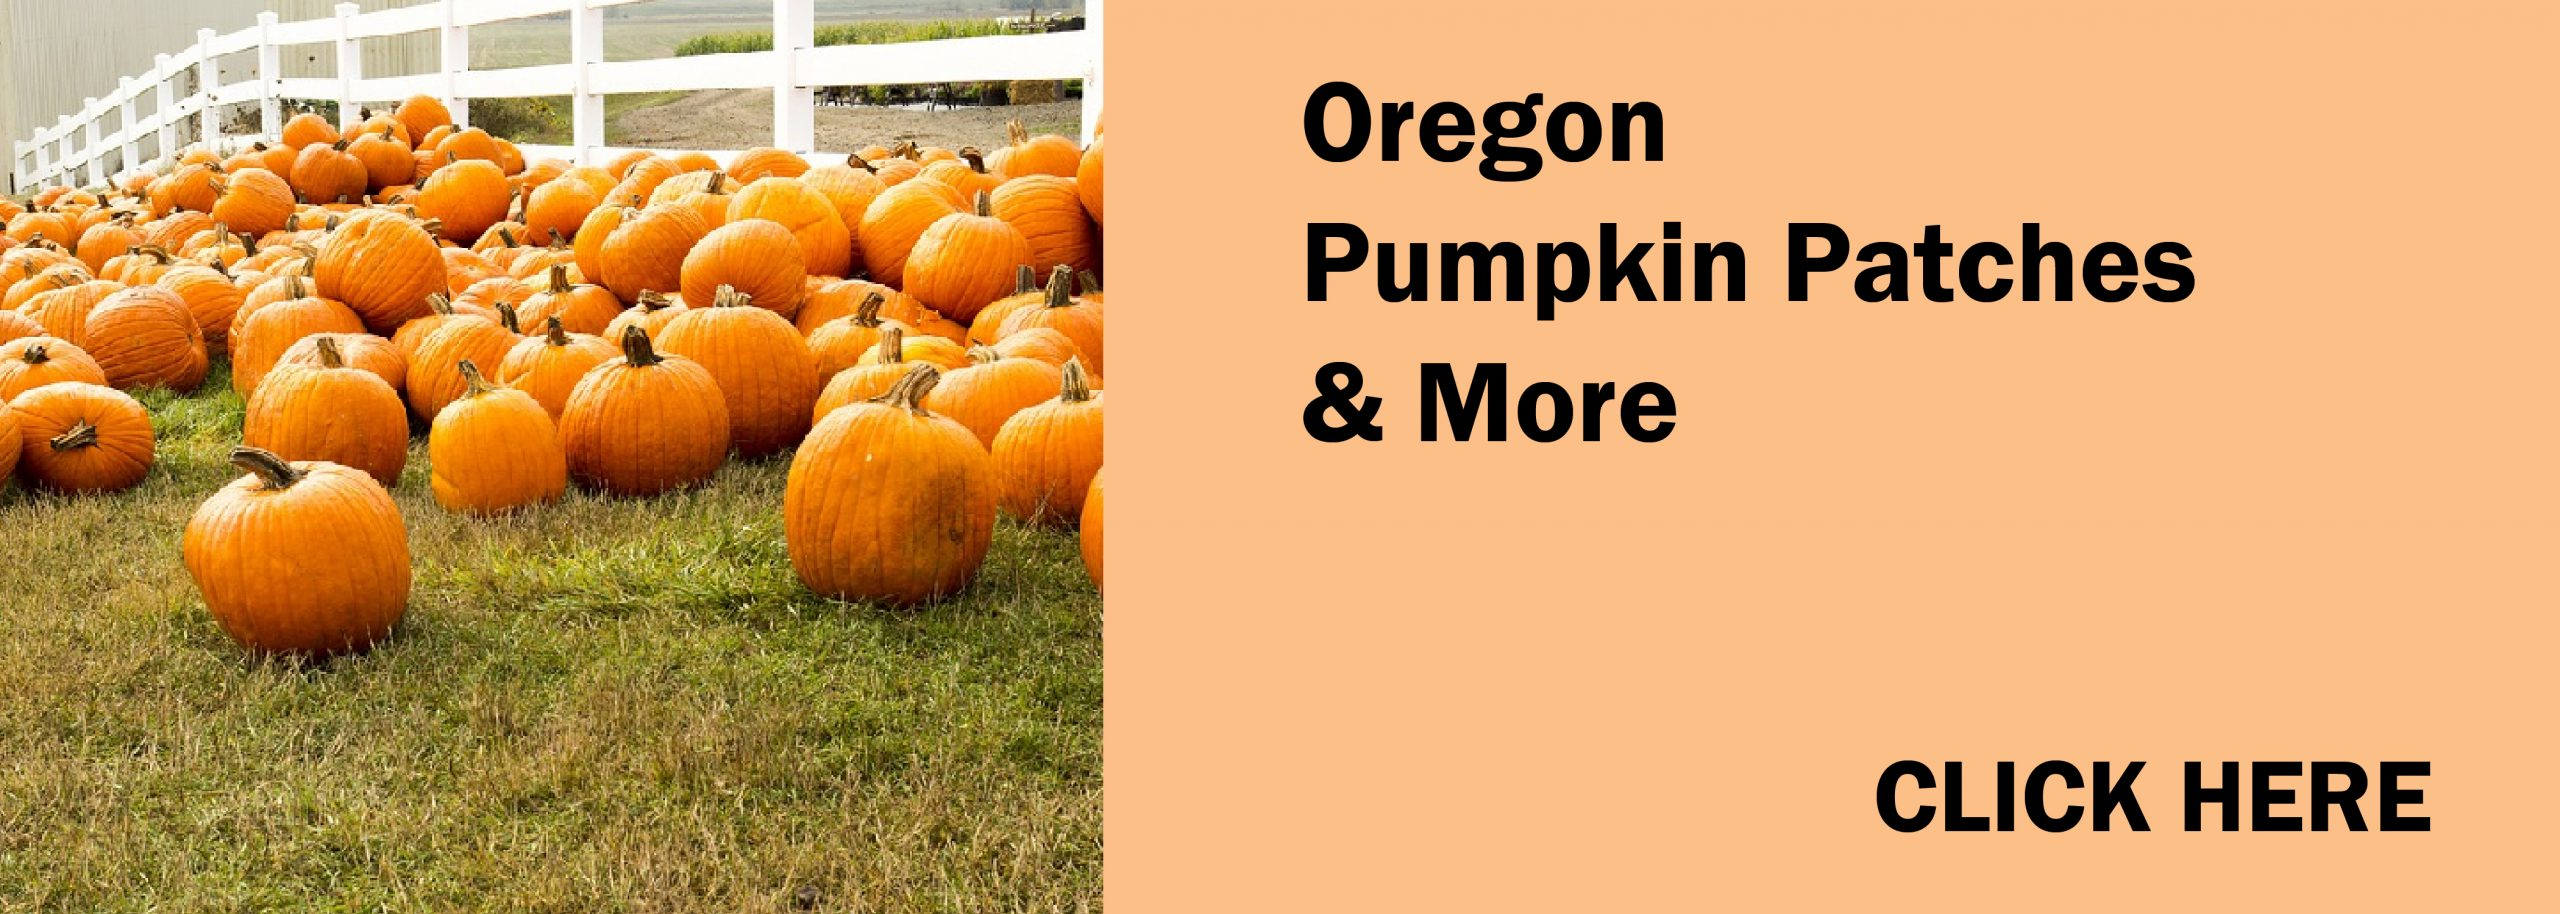 Oregon Pumpkin Patches & More 2021